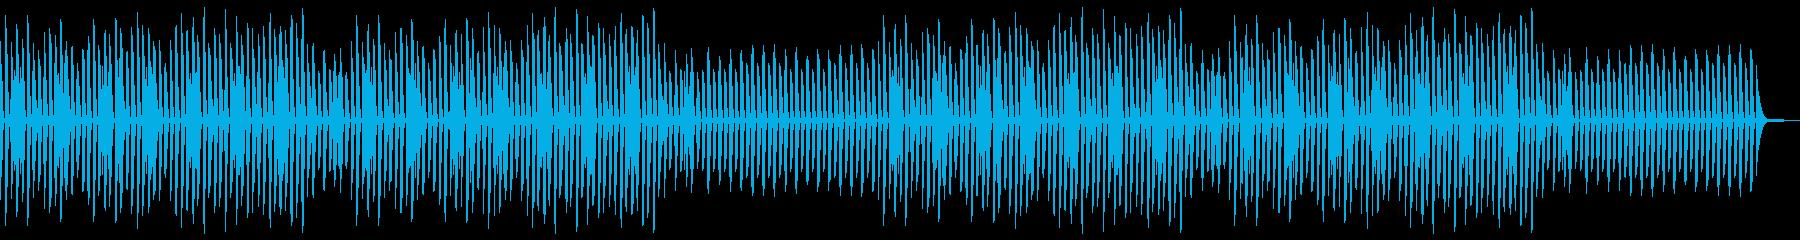 YouTube・かわいい・ほのぼのピアノの再生済みの波形